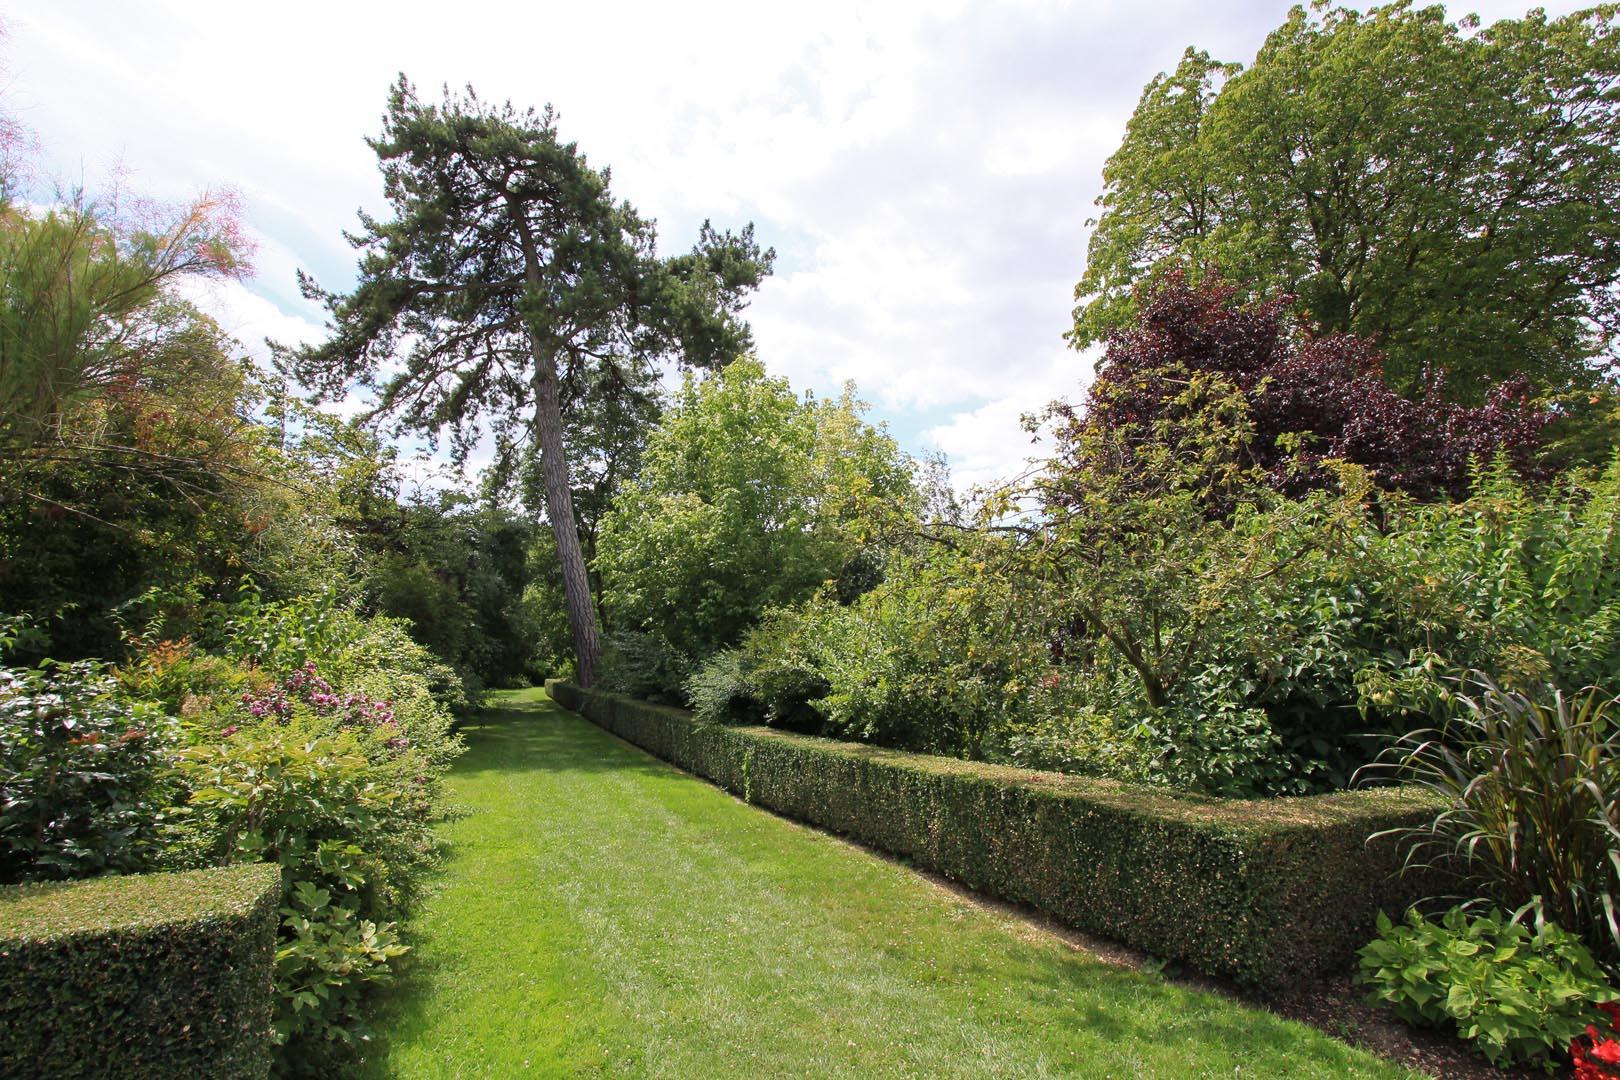 Jardin du roi for Jardin remarquable ile de france